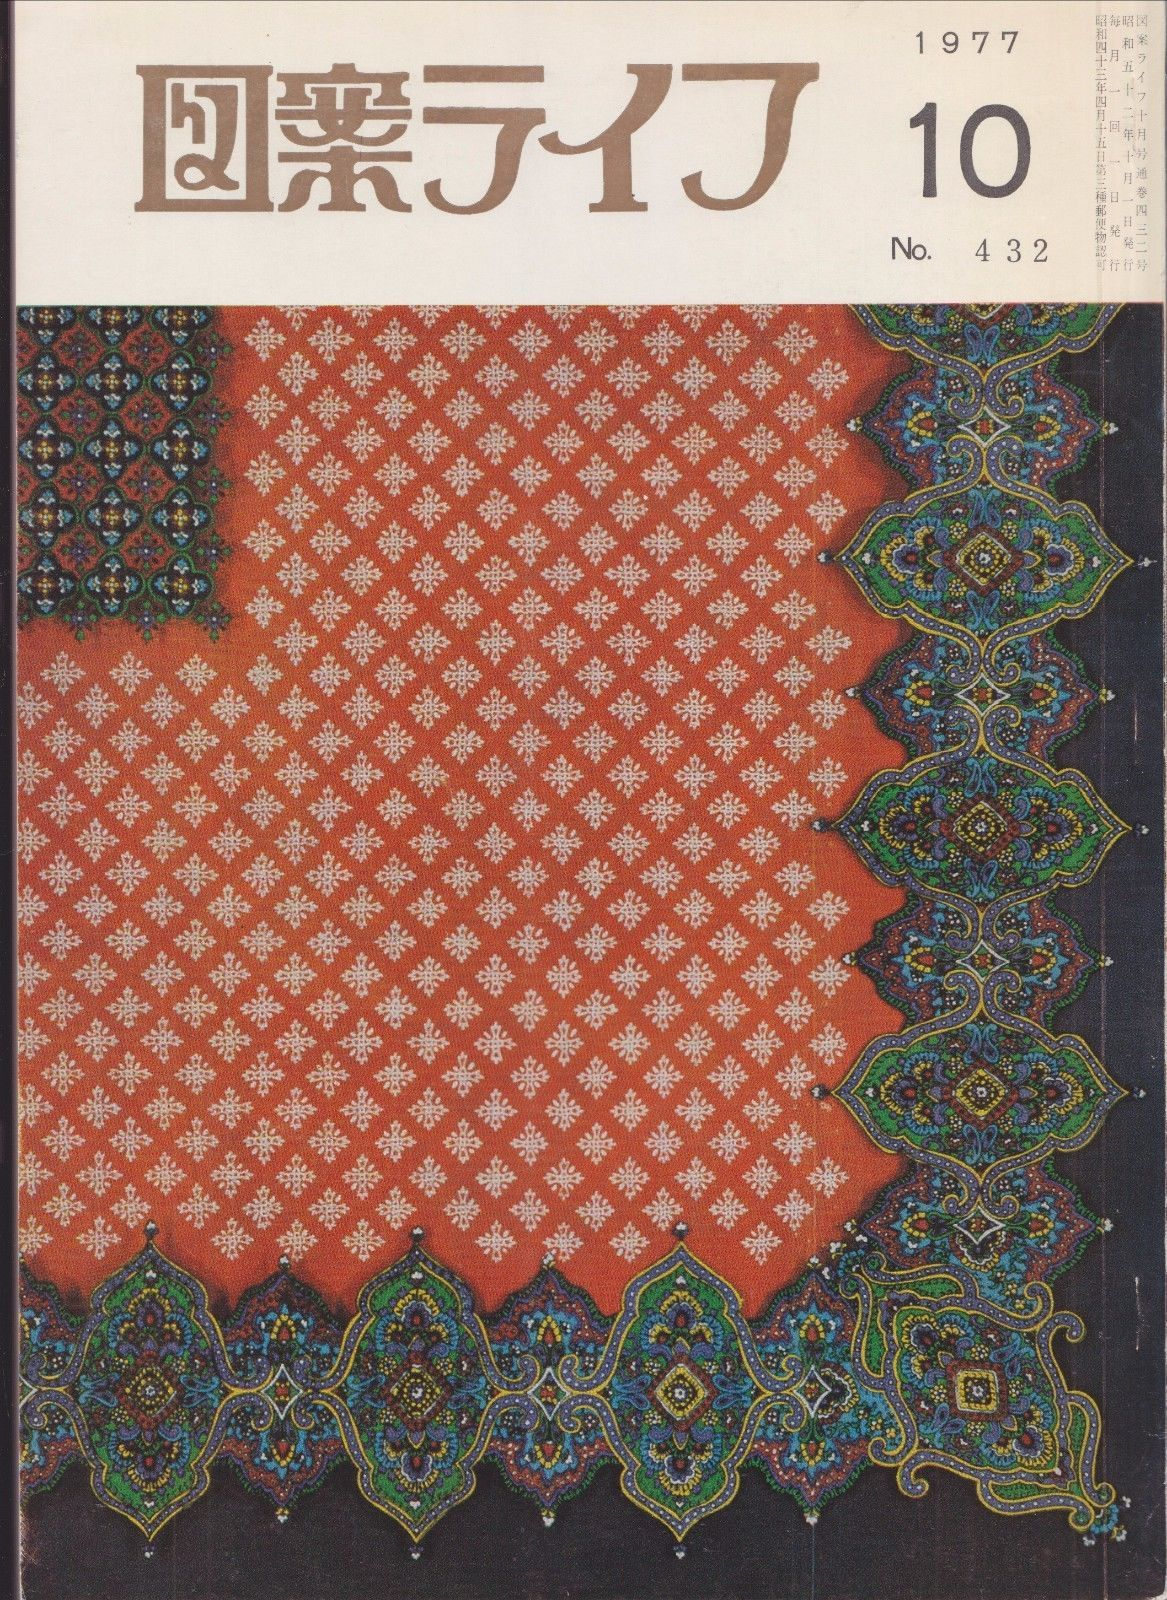 Japanese textile fabric design zuan life vol 27 no 11 1977